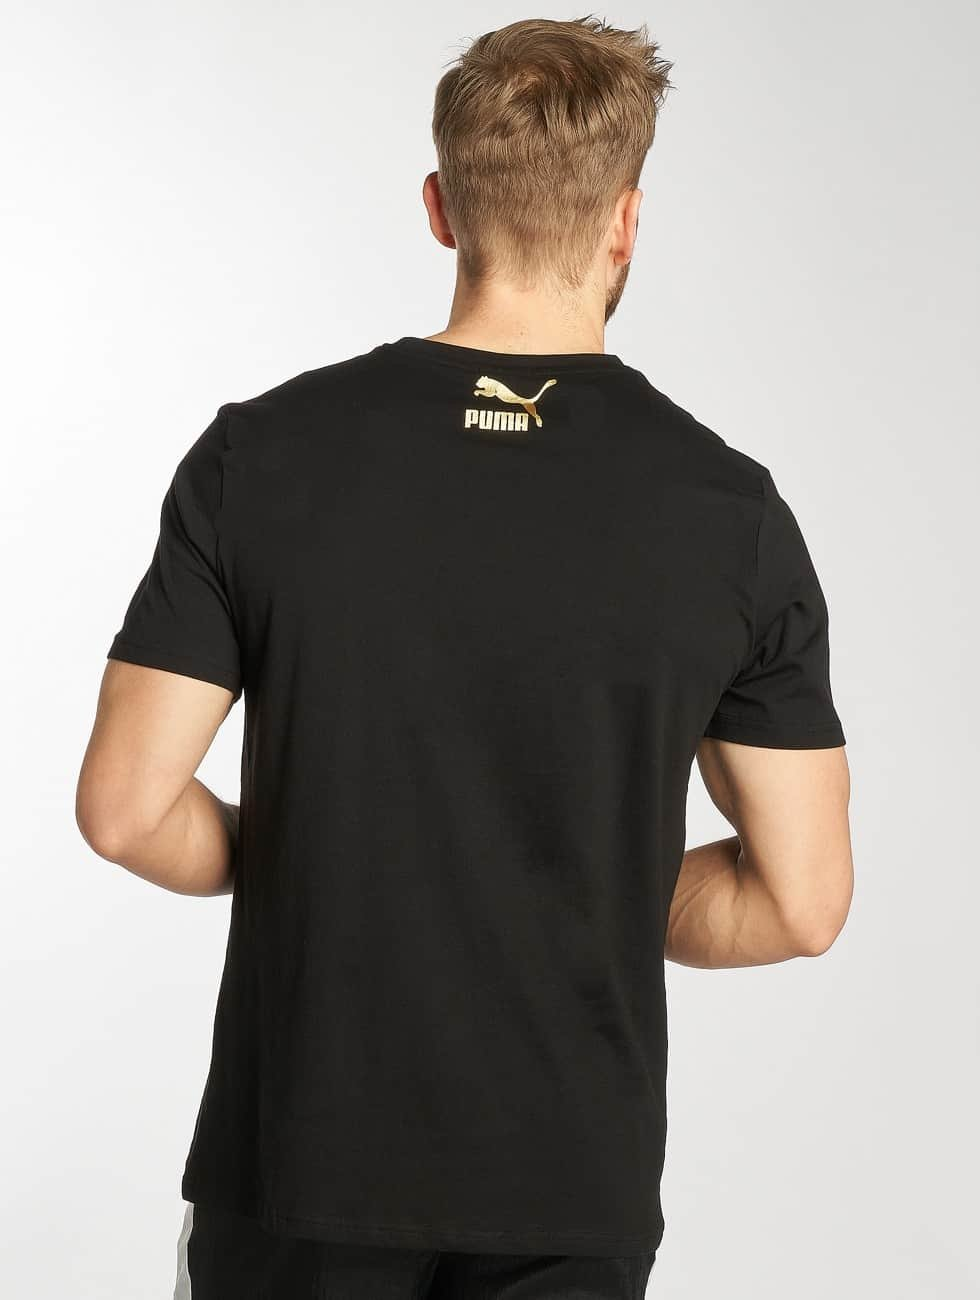 Puma T-shirt Suede svart